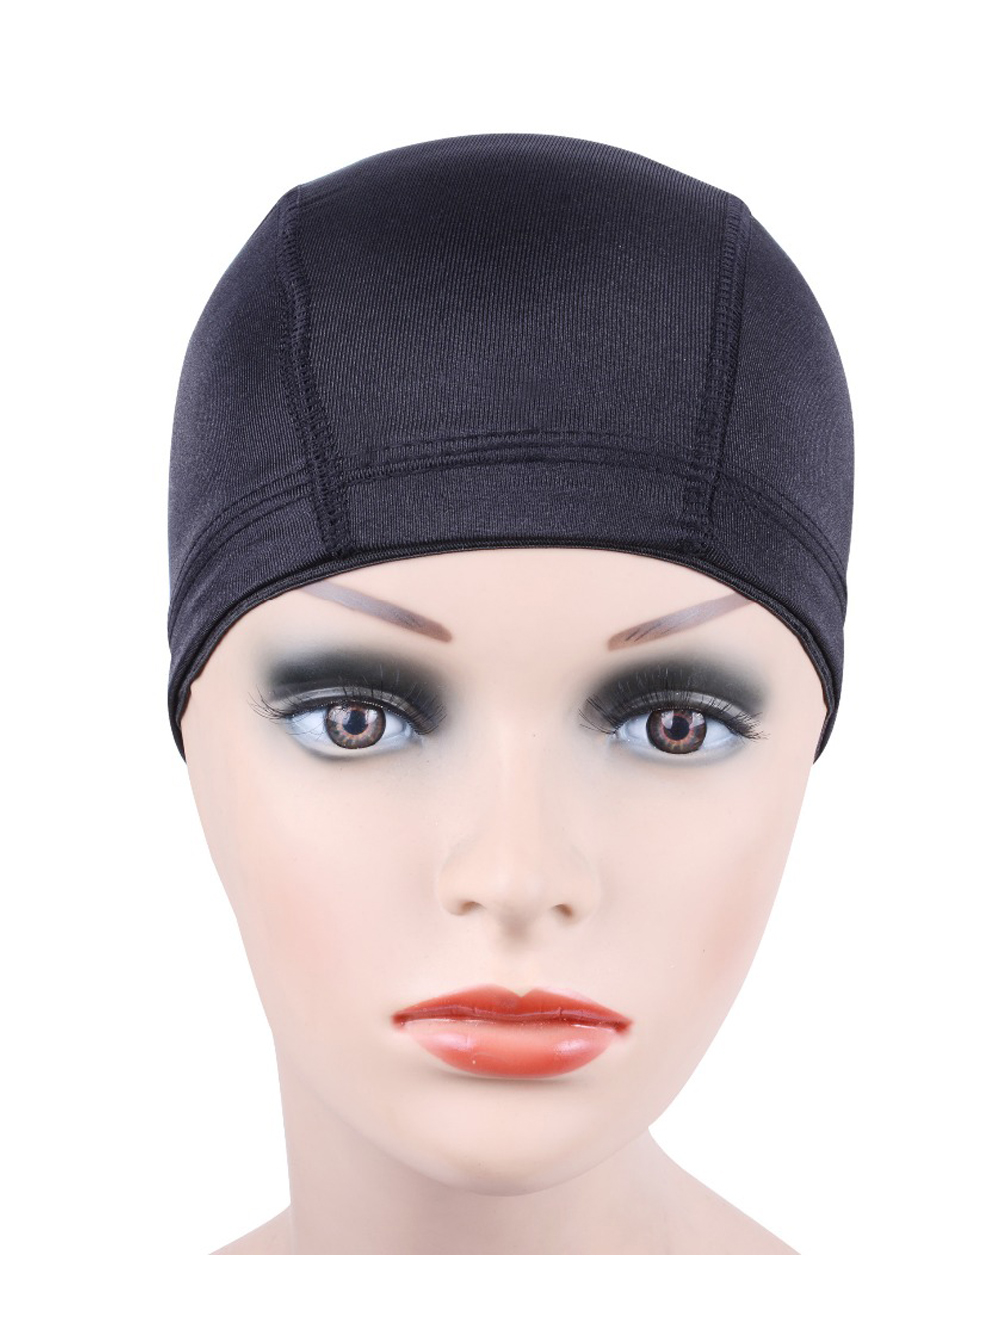 Wig-Cap Hair-Net Mesh Making-Wigs Elastic Glueless for 1pcs